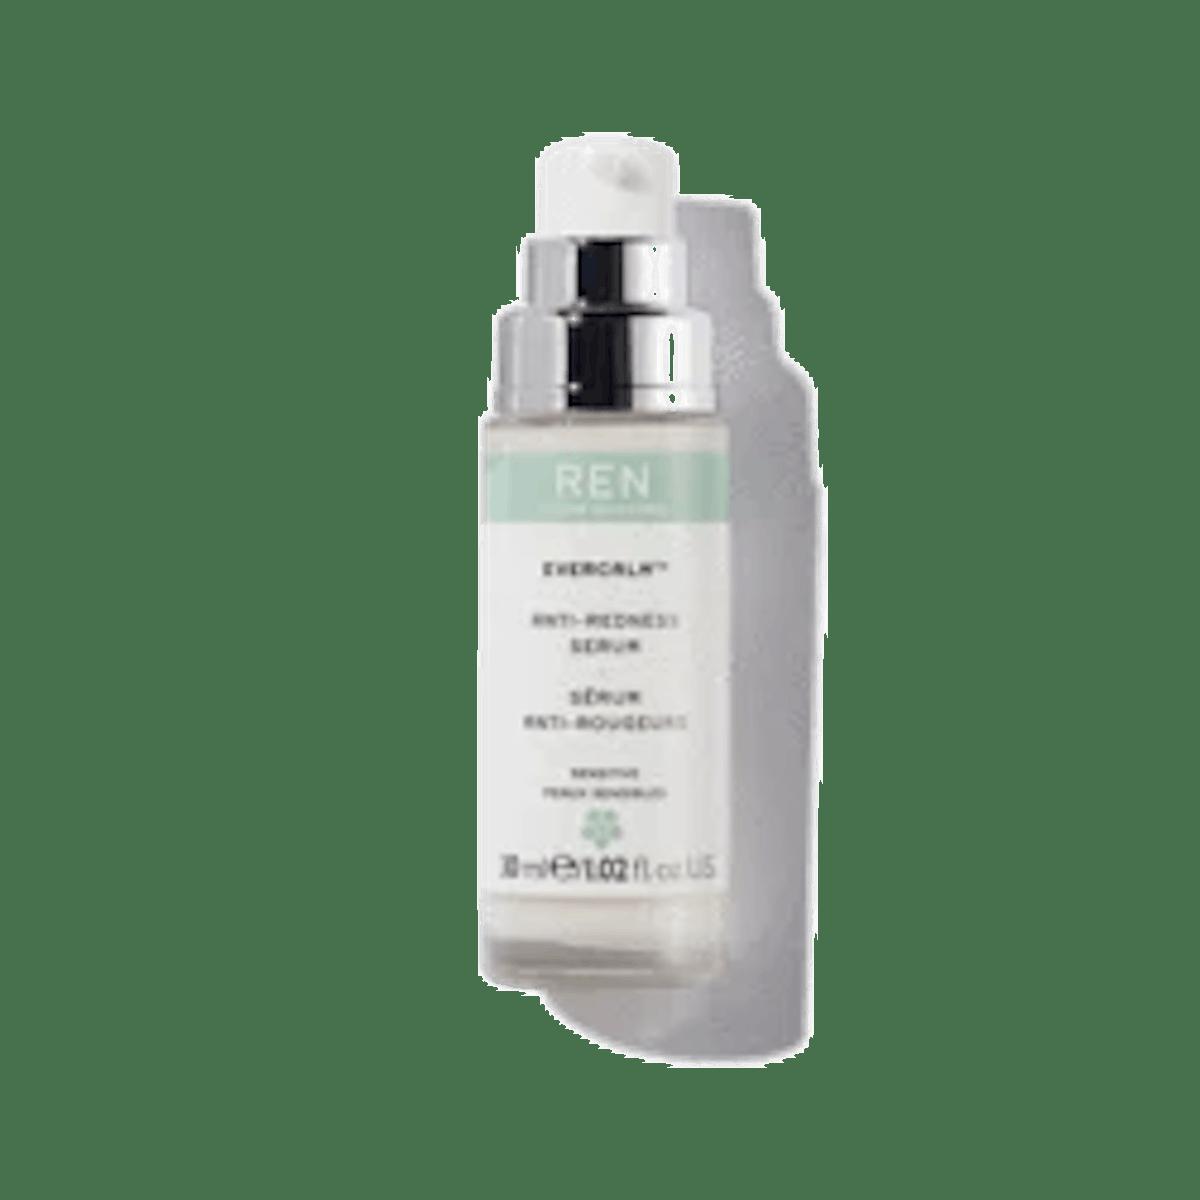 Evercalm Anti-Redness Serum